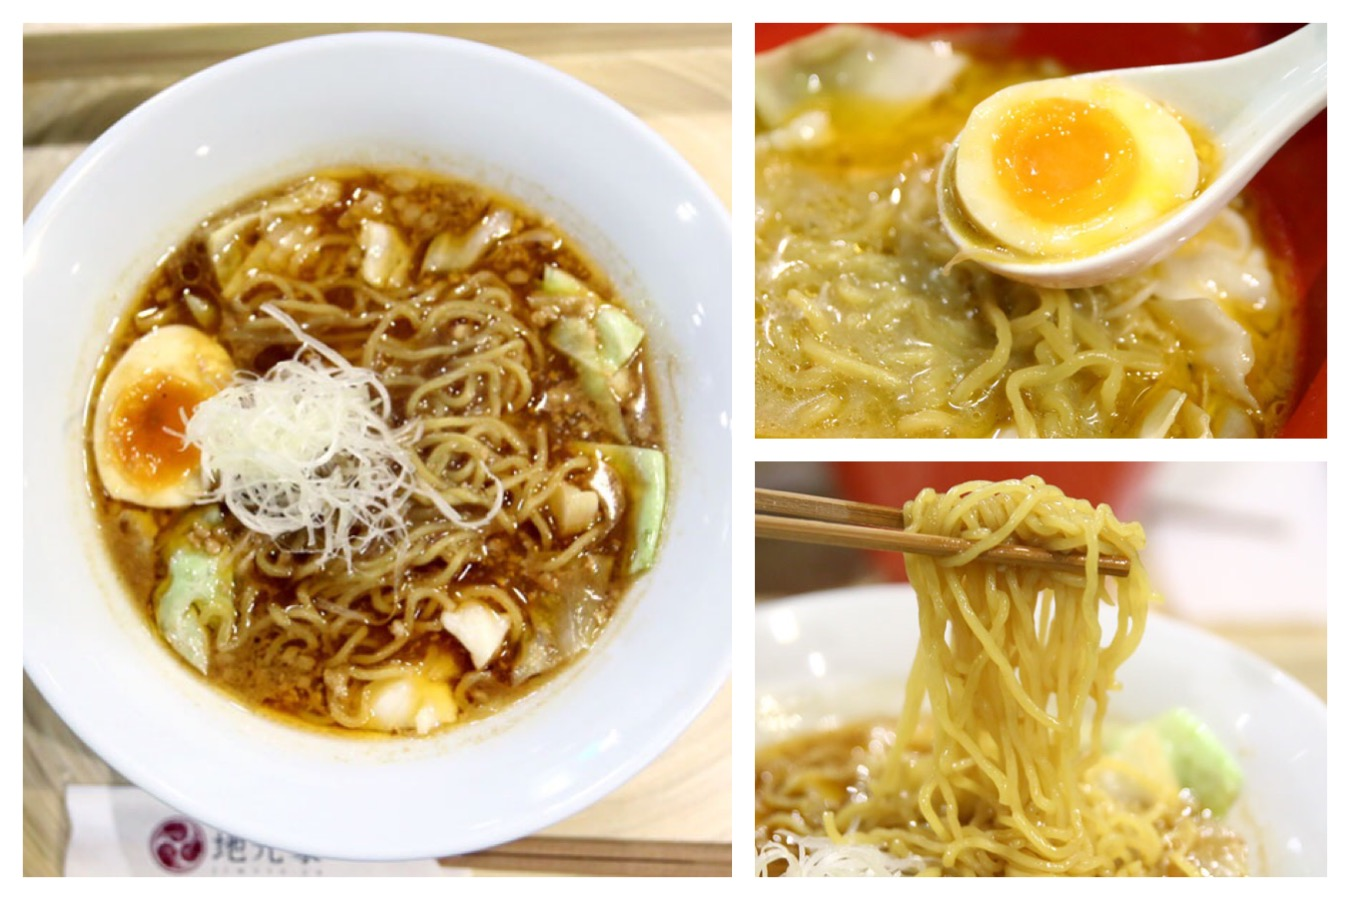 Jimoto Ya – Ebi Ramen By Michelin Starred Chef From Mieda Arrives To Singapore